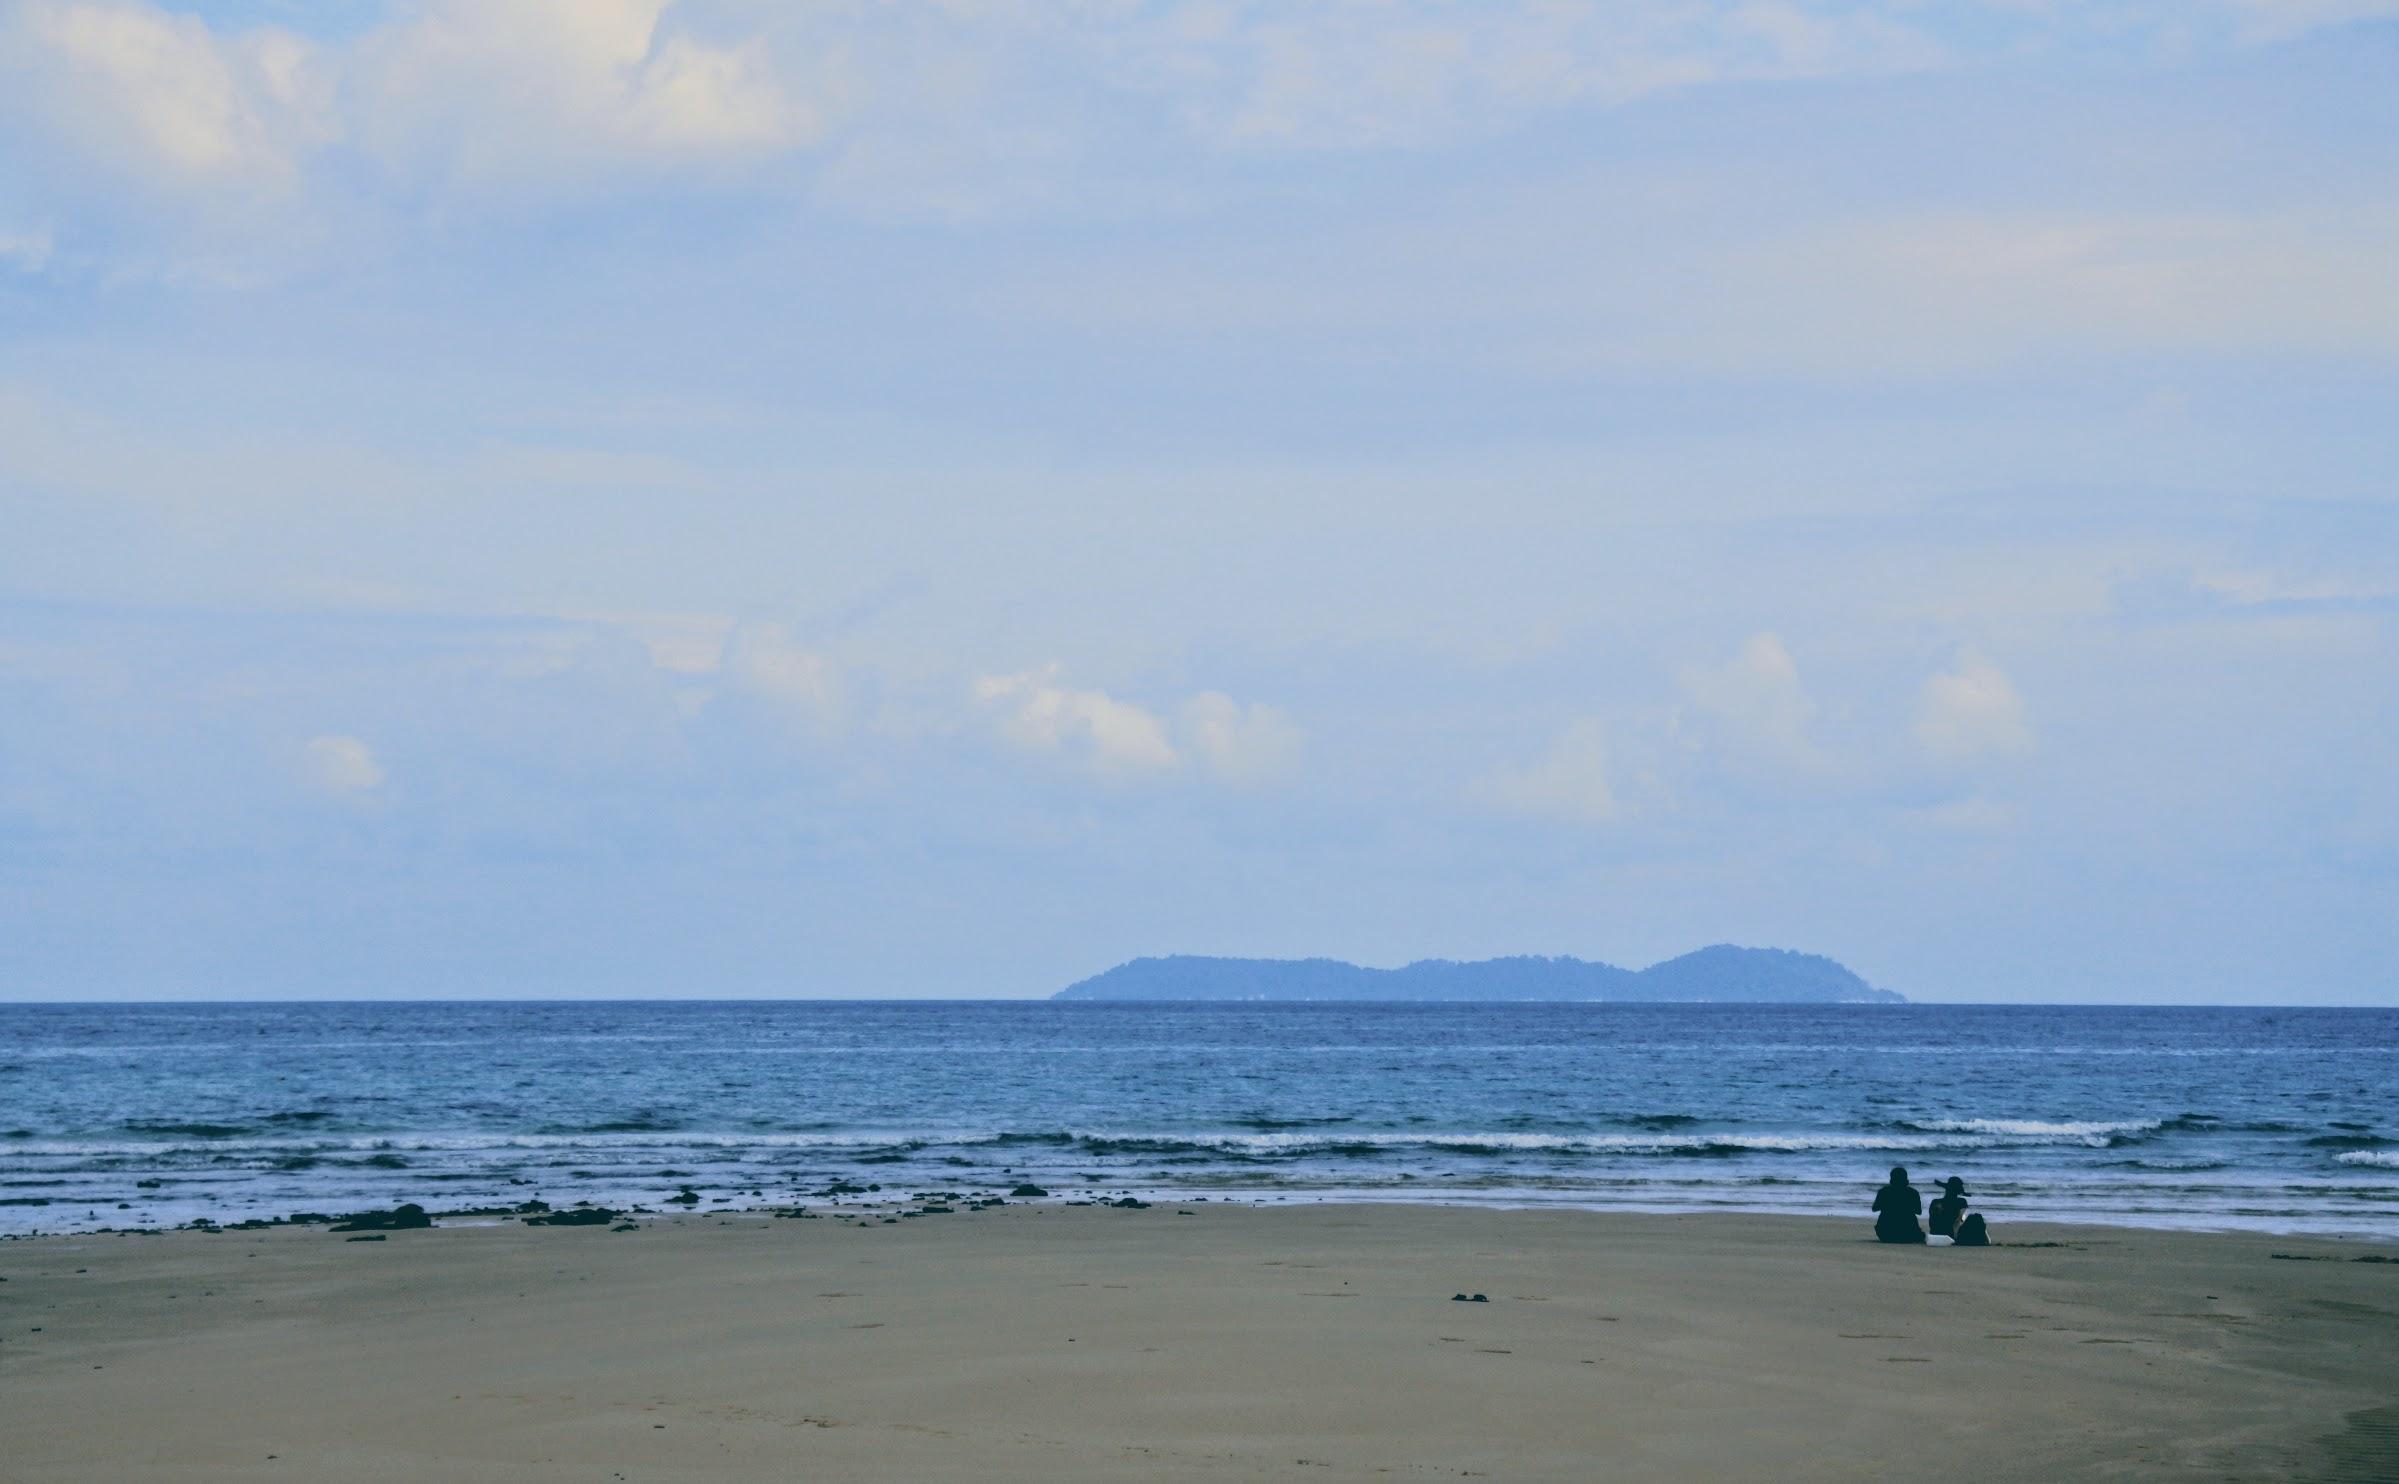 The sandbank